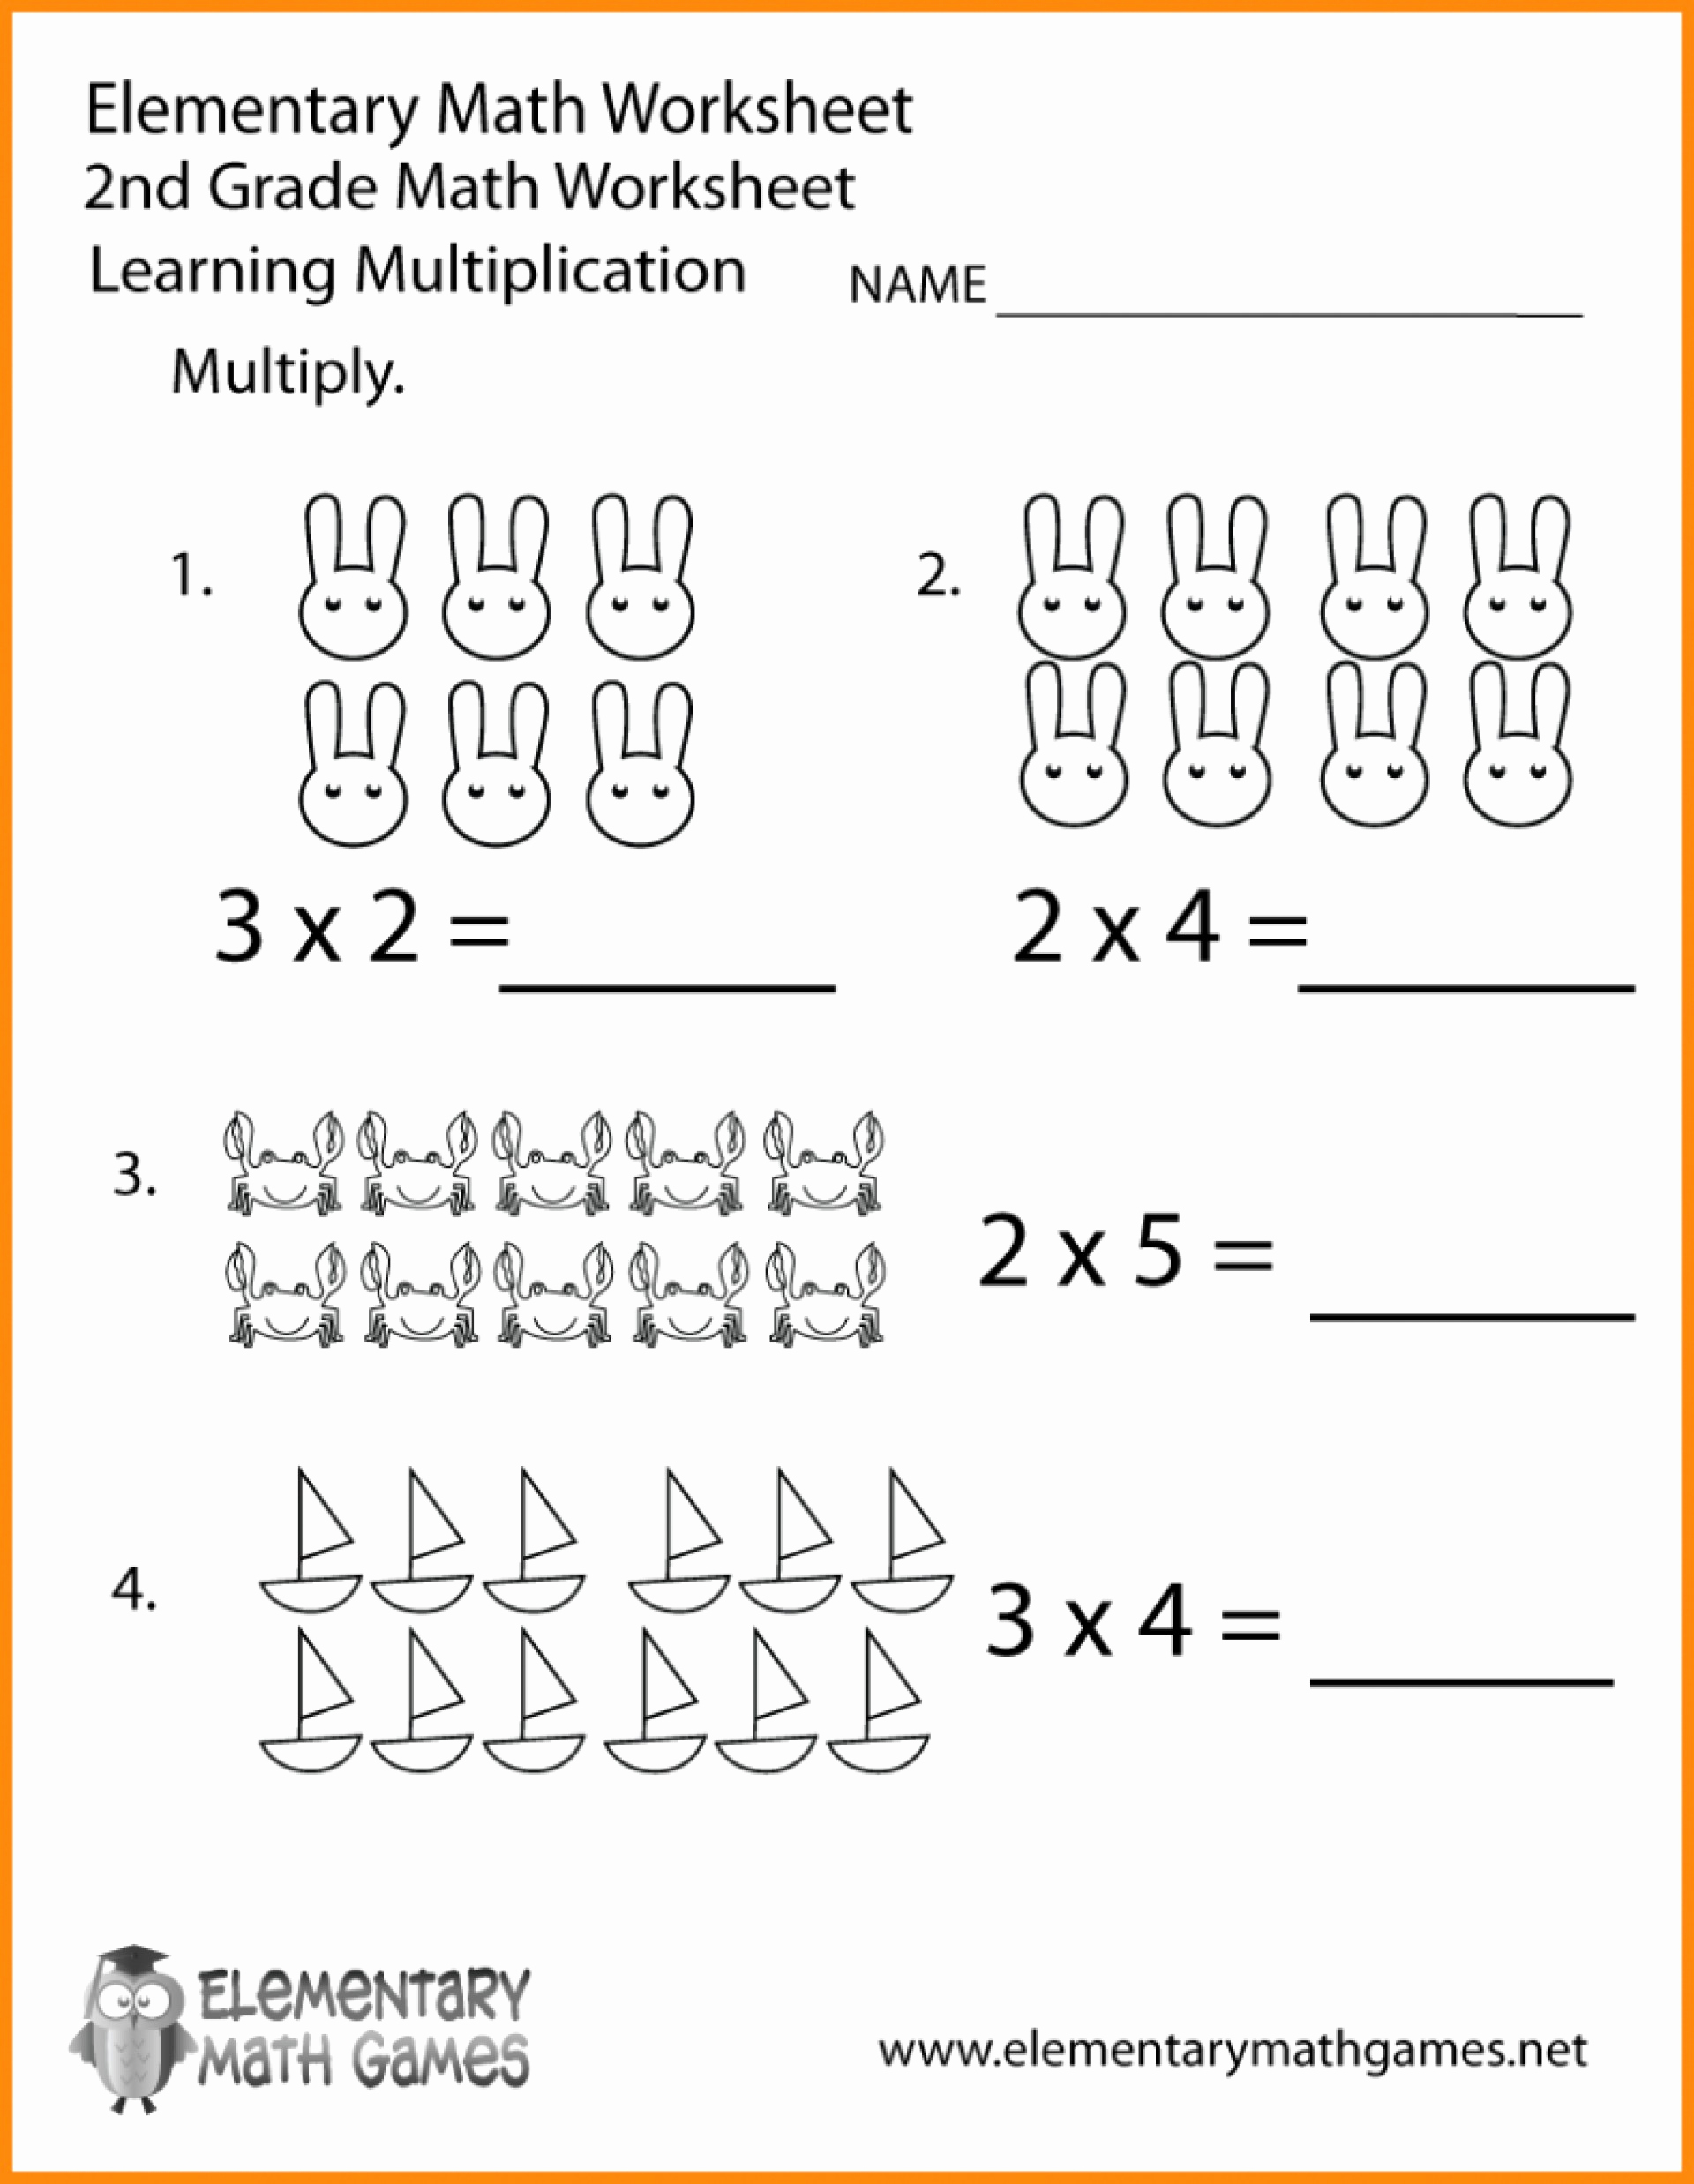 Arrays Worksheets Grade 2 Best Of Array Worksheets to Download Array Worksheets 2nd Grade